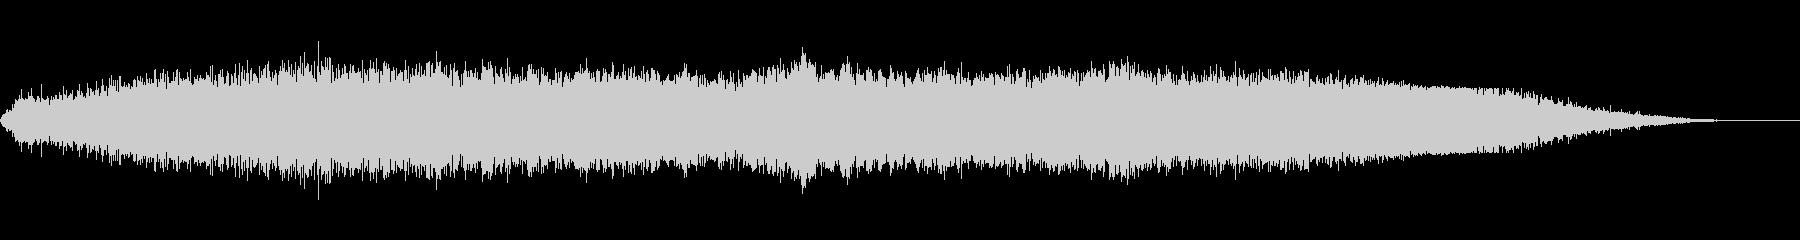 KANTホラーボイス系効果音20073の未再生の波形